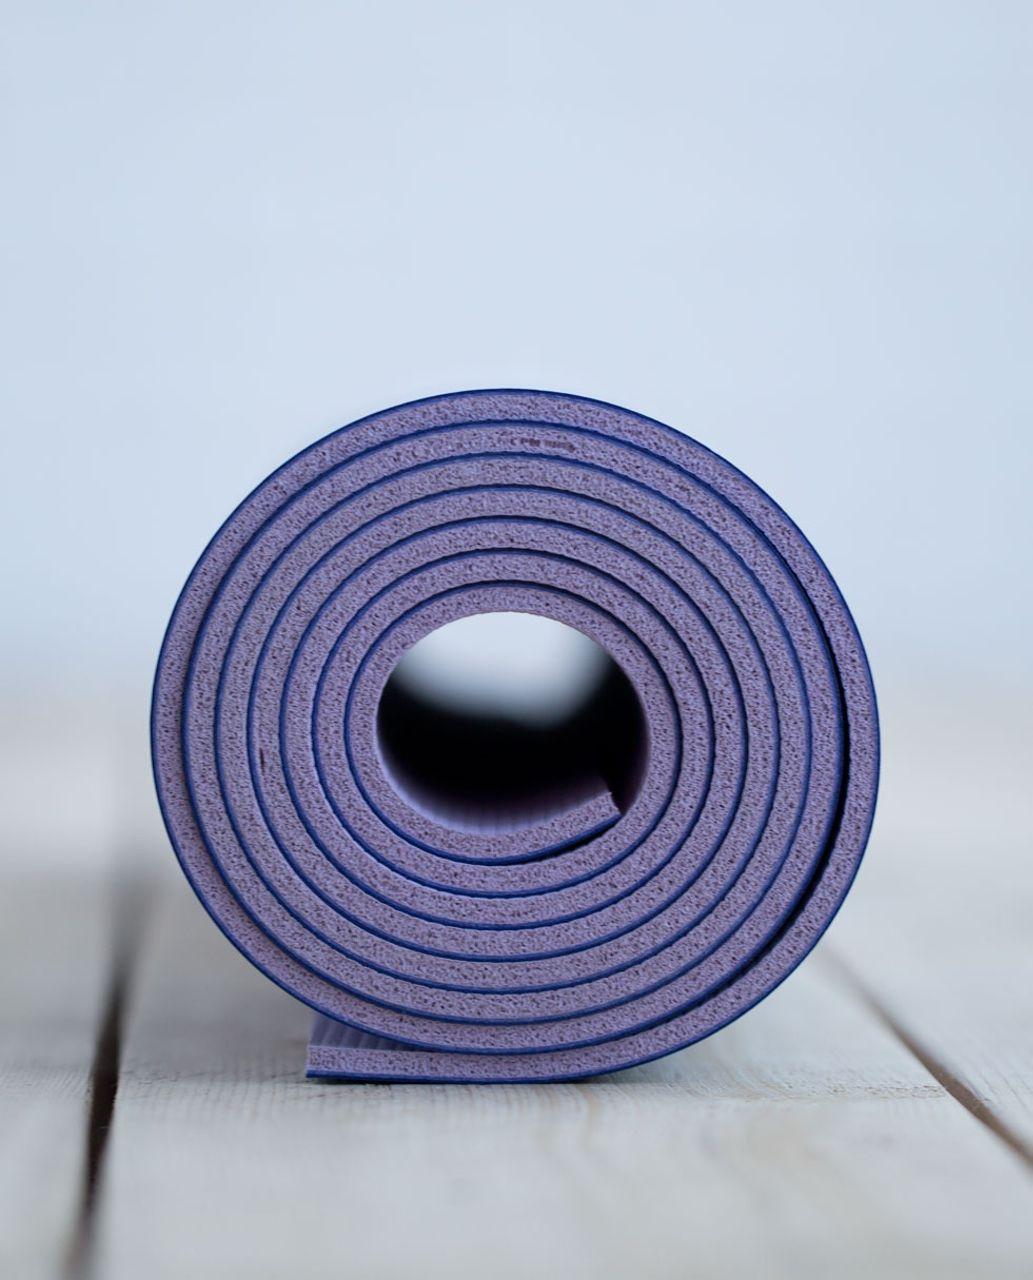 Lululemon The Reversible Mat 5mm - Iris Flower / Pretty Purple